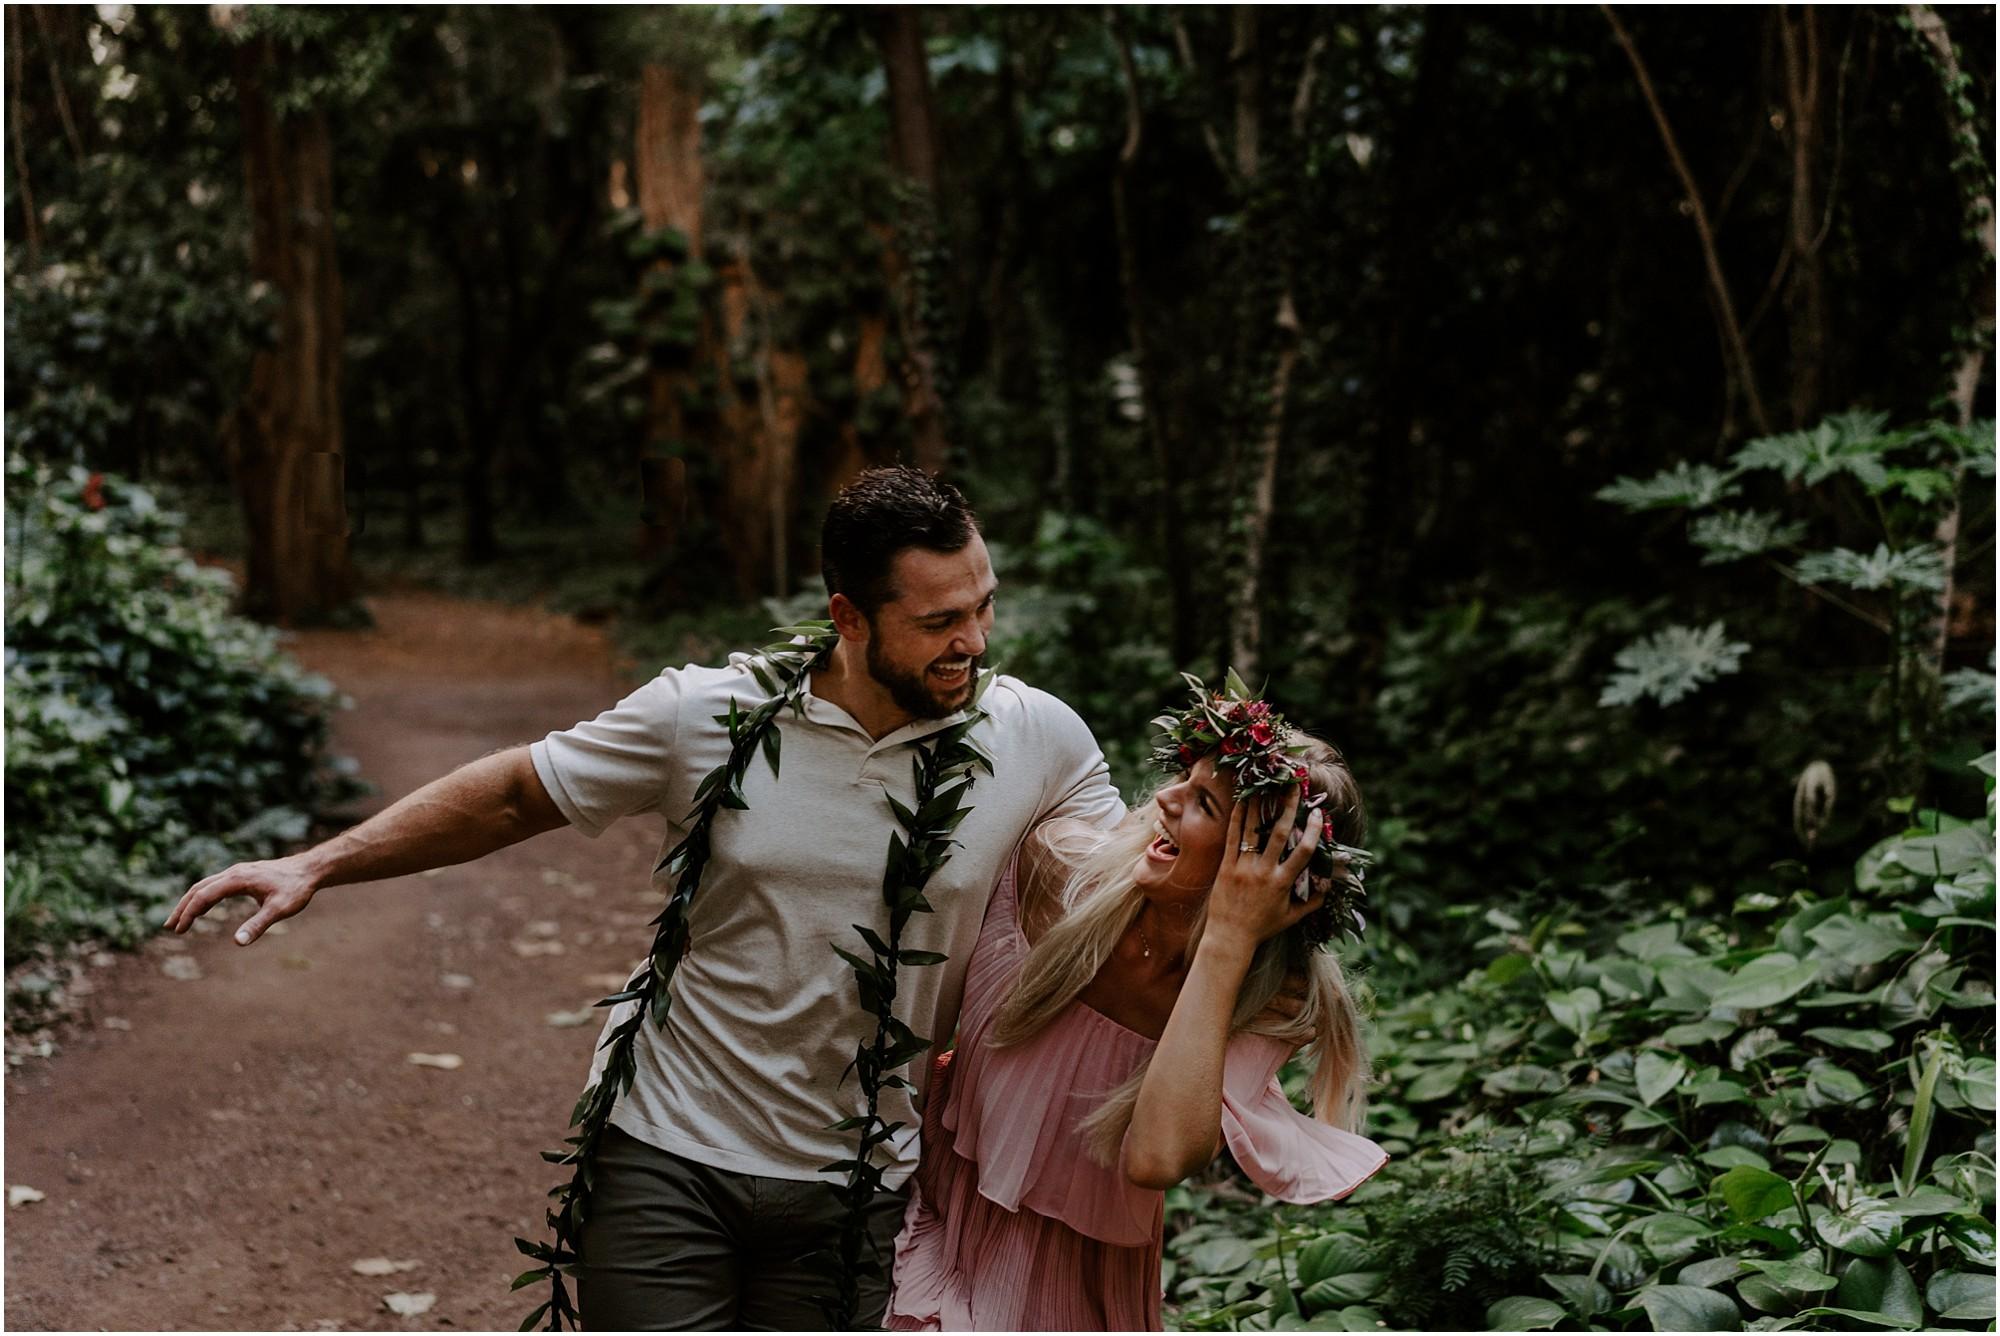 maui-adventure-session-hawaii-elopement-photographer_0015.jpg